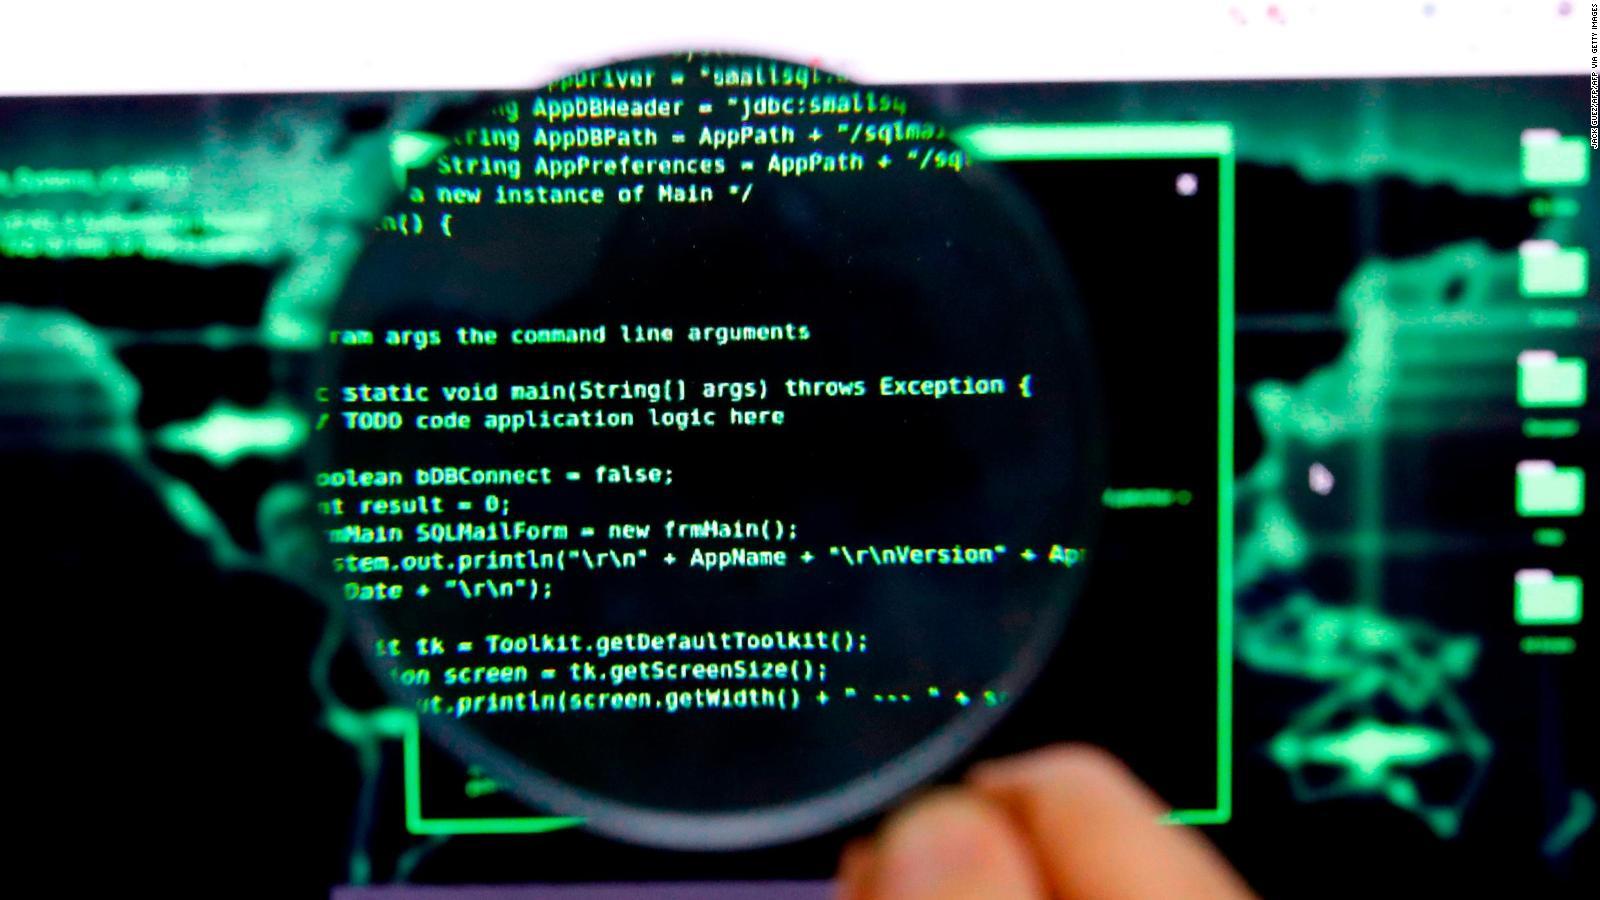 Facebook bloquea a presuntos piratas informáticos iraníes que buscaban espiar a personal militar de EE.UU.